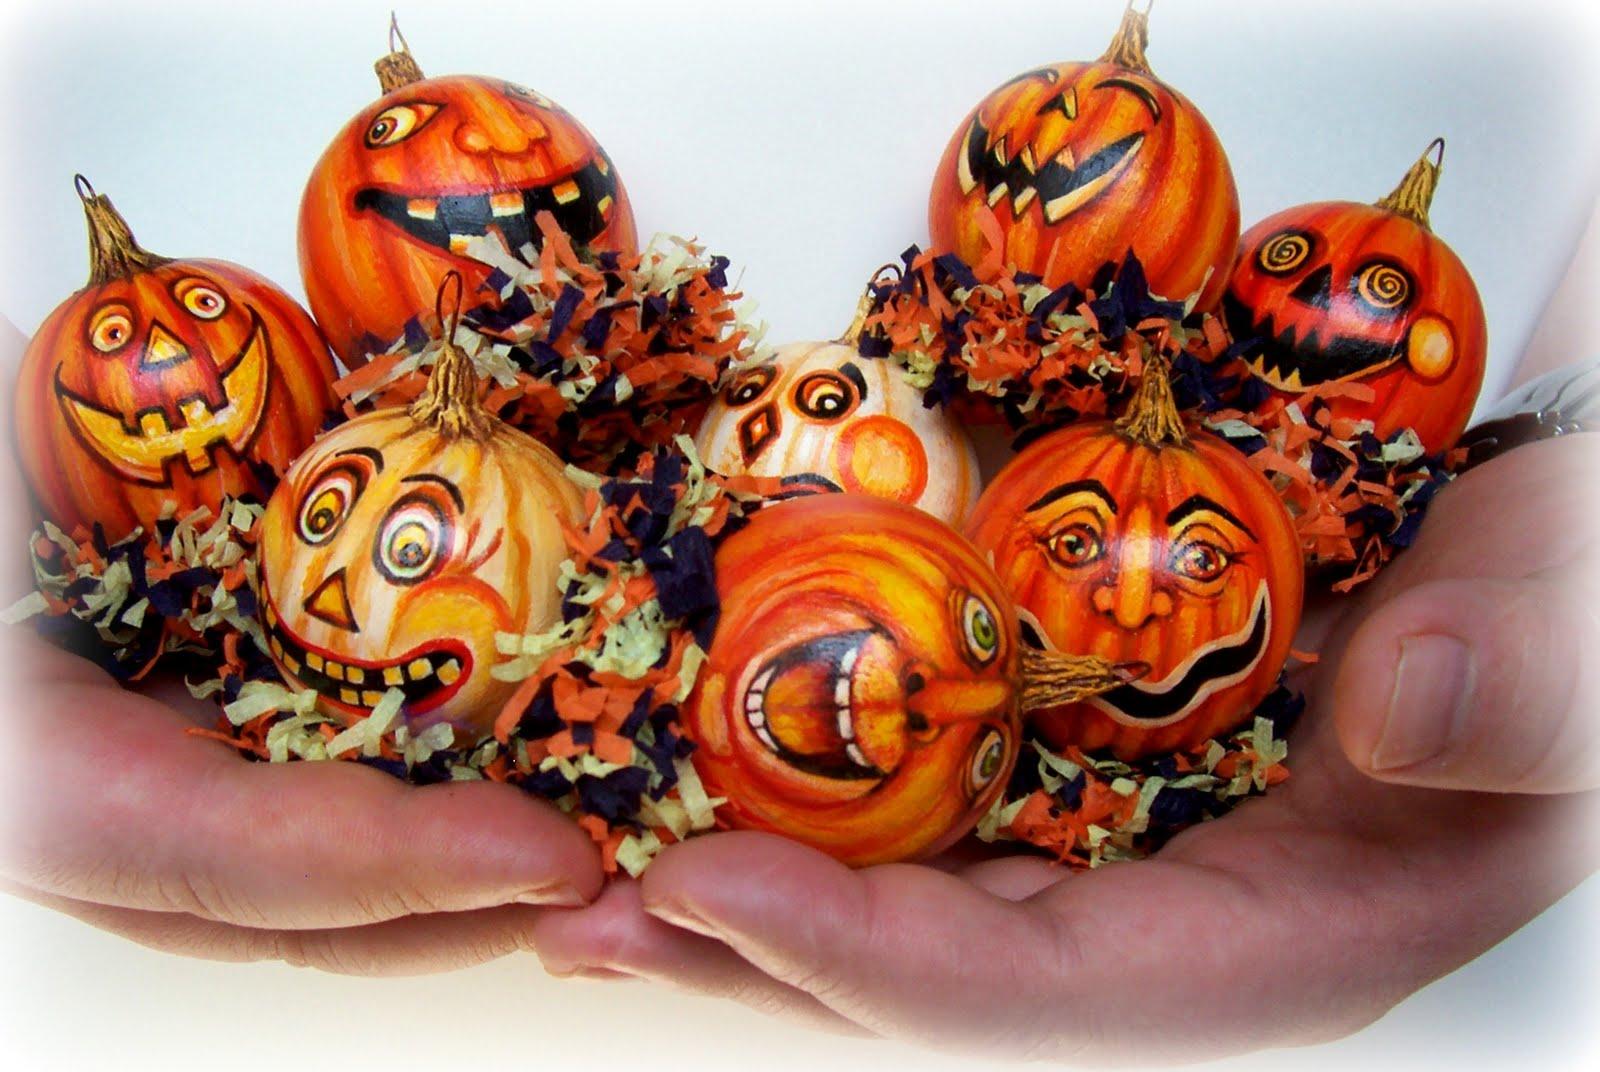 Light And Shadow Studio Plethora Of Pumpkins